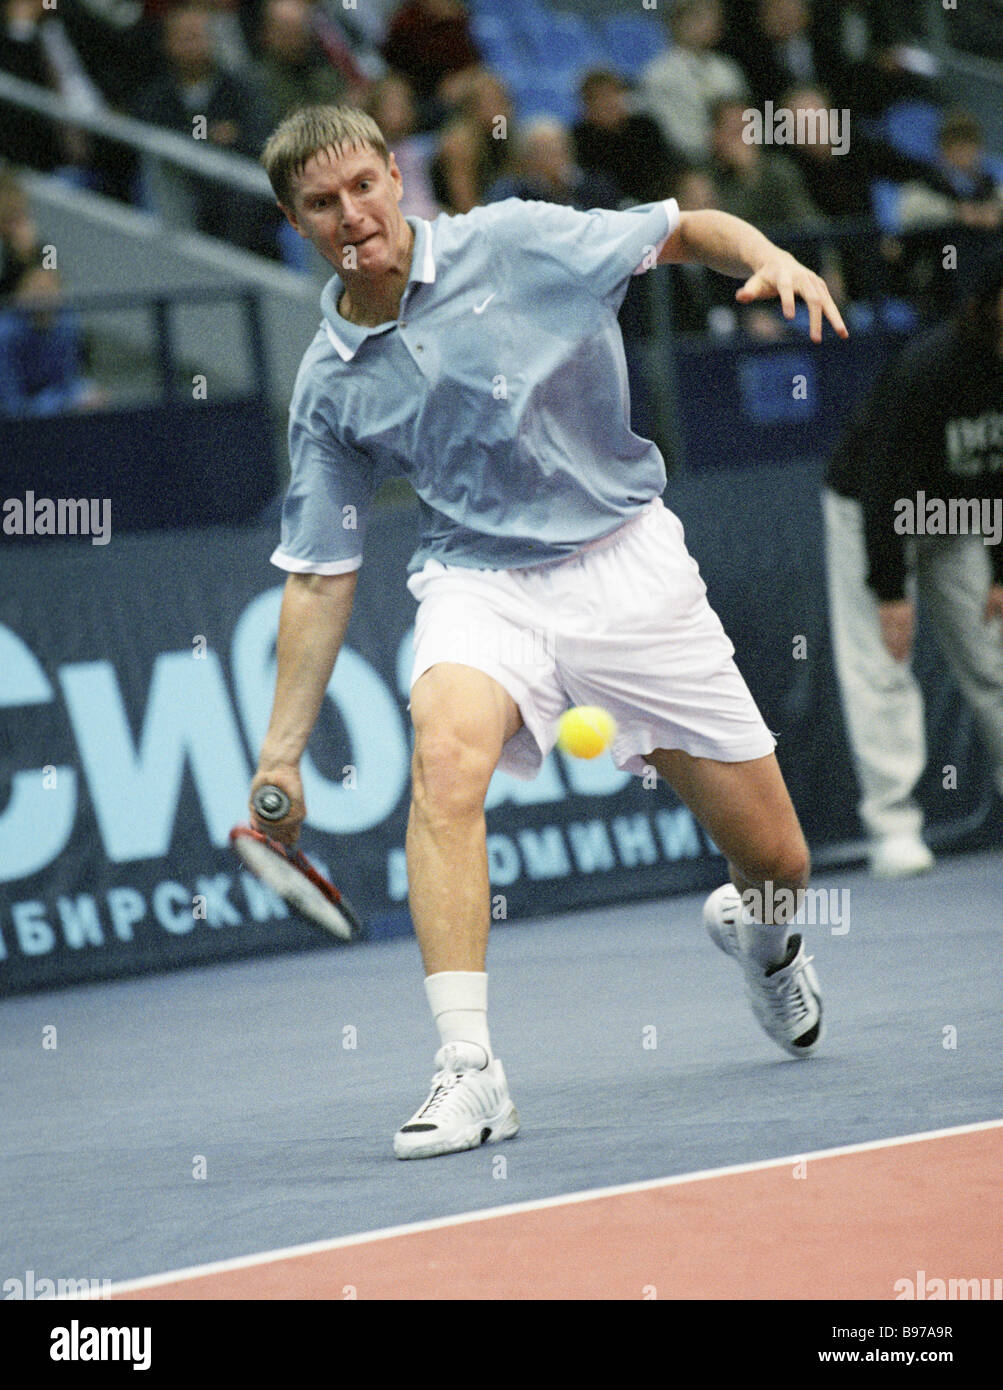 Russian tennis player Yevgeny Kafelnikov at the Kremlin Cup 2000